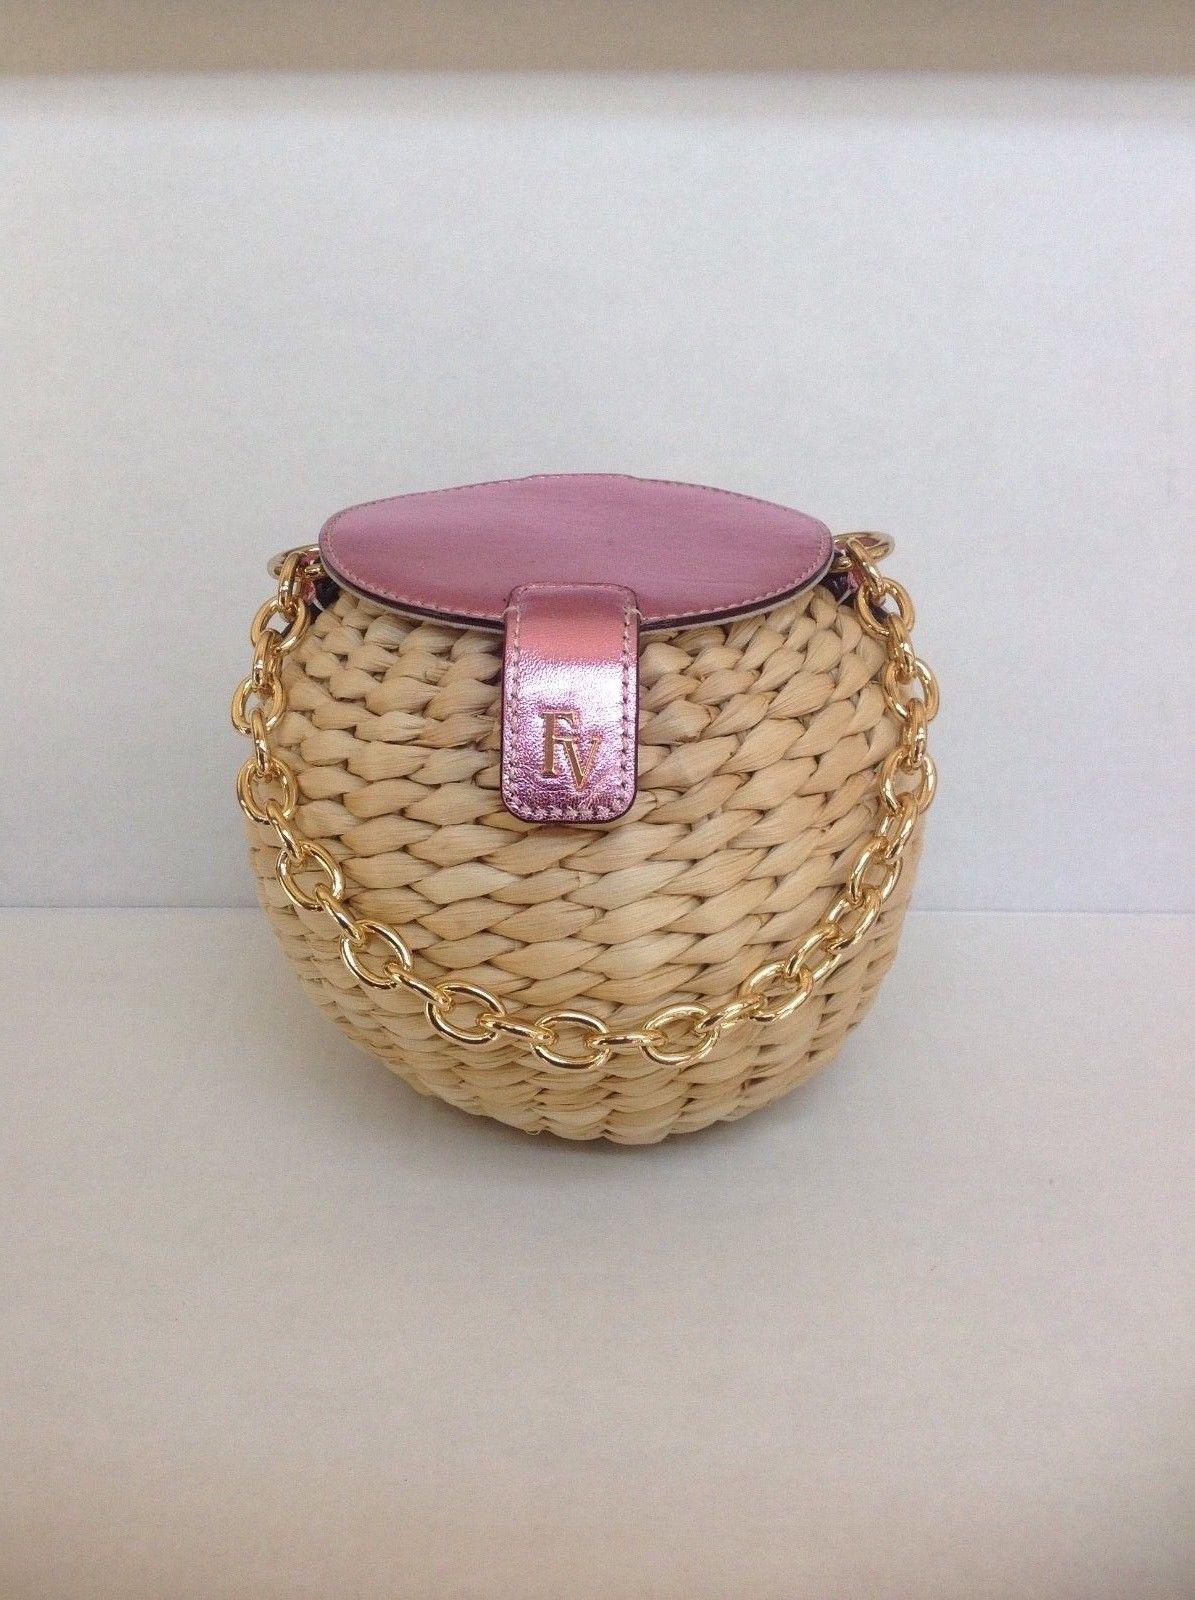 4a48207ed New Frances Valentine honeypot Bucket bag metallic PINK honey pot ...